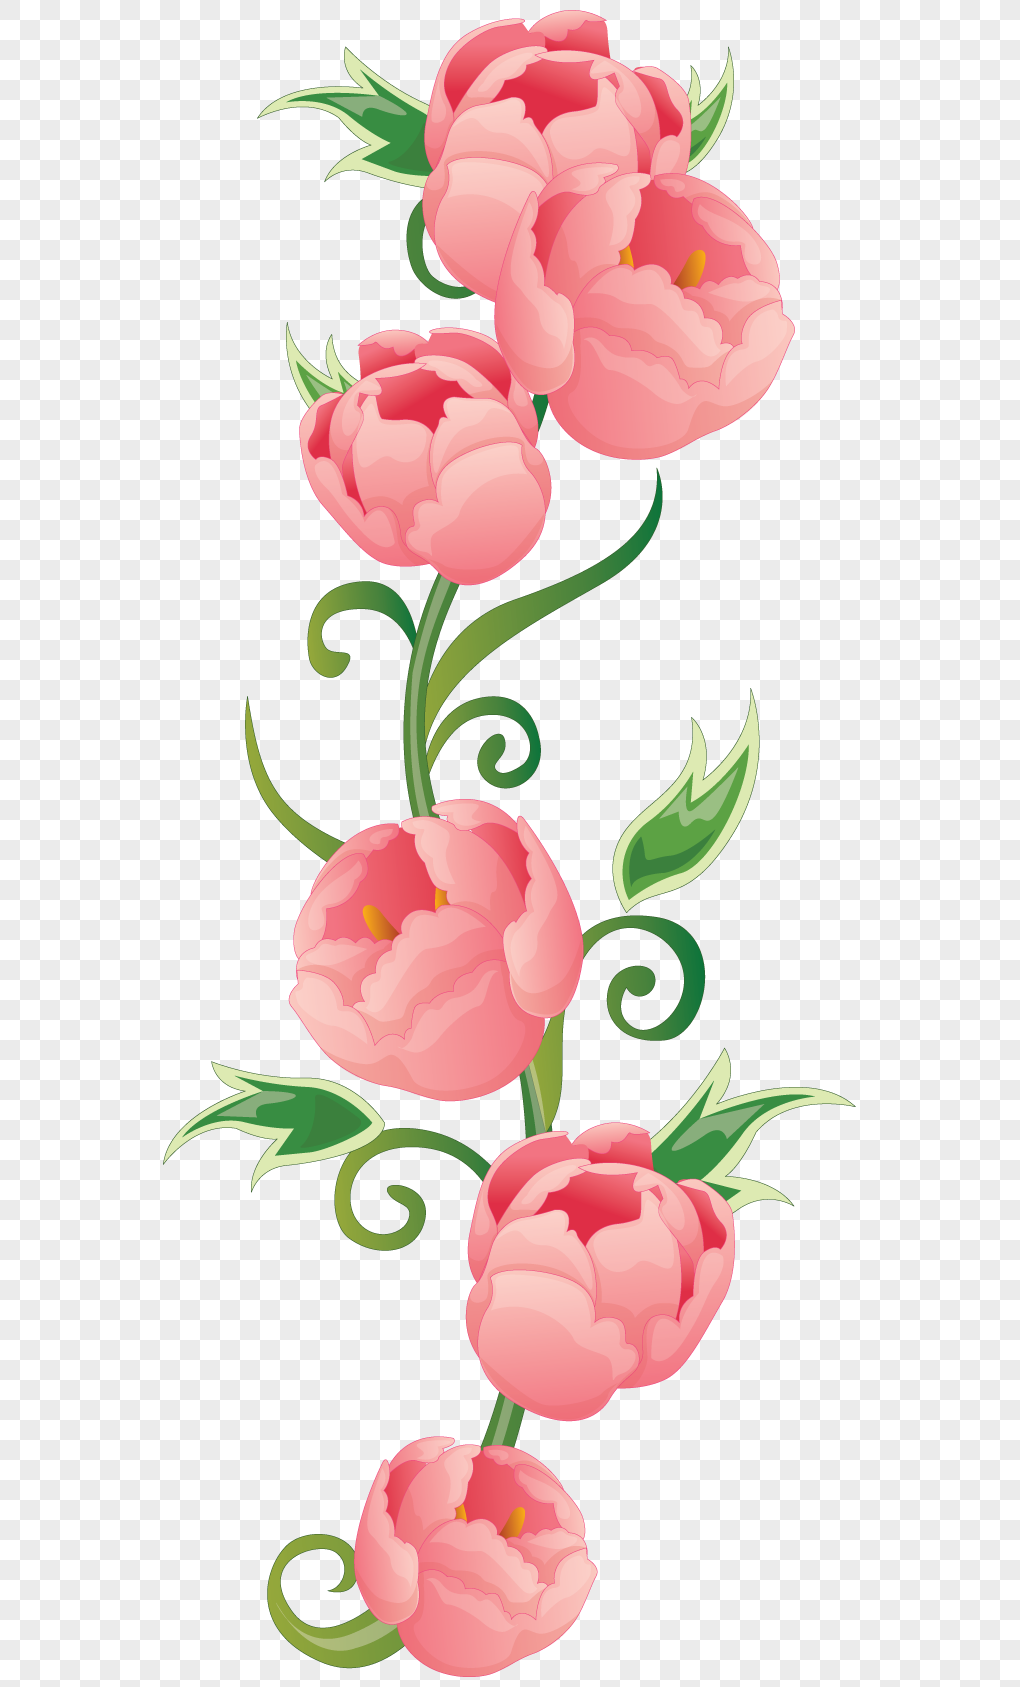 Cartoon pink roses png imagepicture free download 400478885lovepik cartoon pink roses mightylinksfo